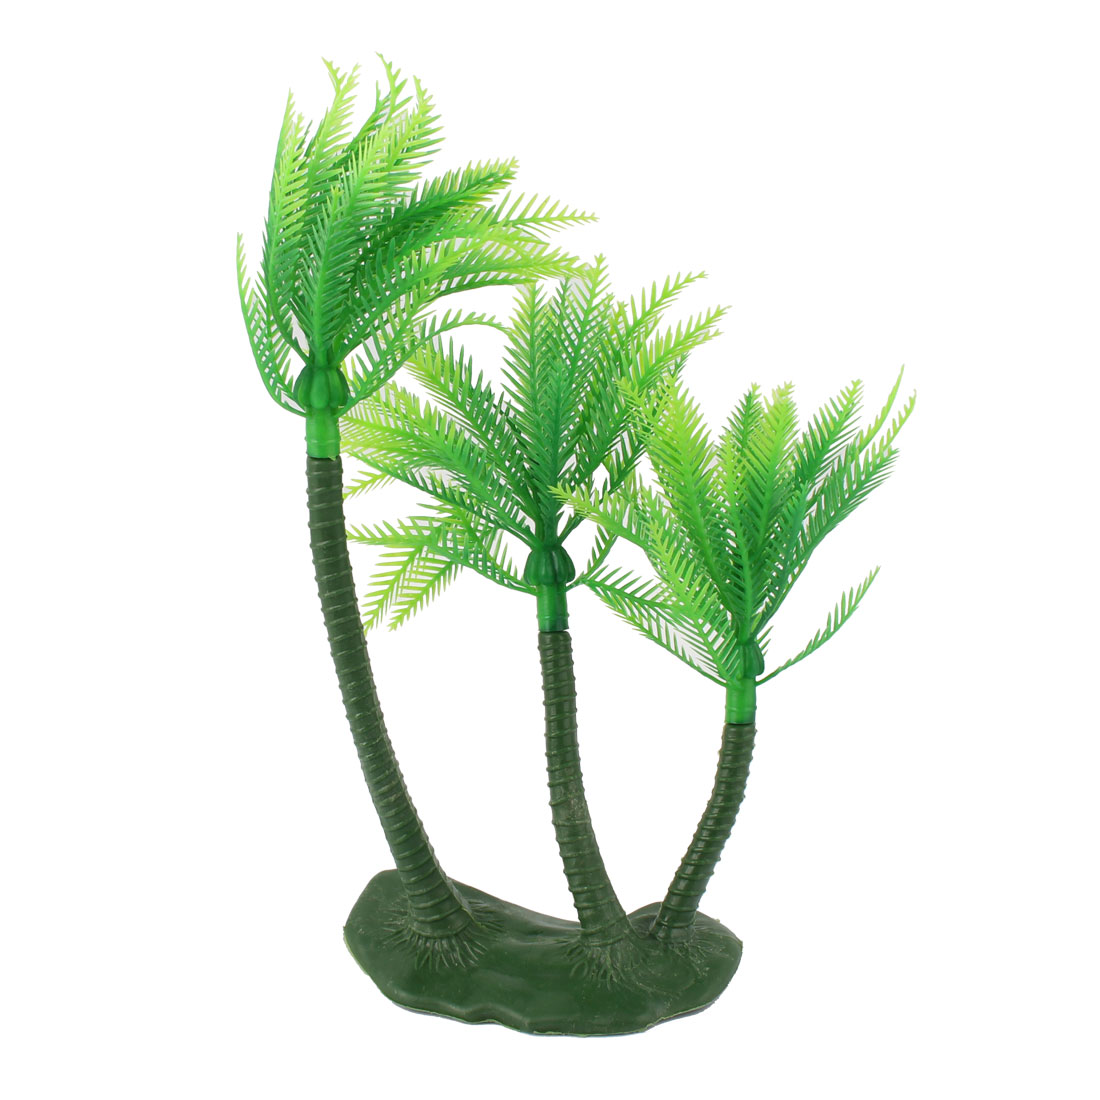 Aquarium Fish Tank Plastic Coconut Tree Shaped Plant Ornament Green